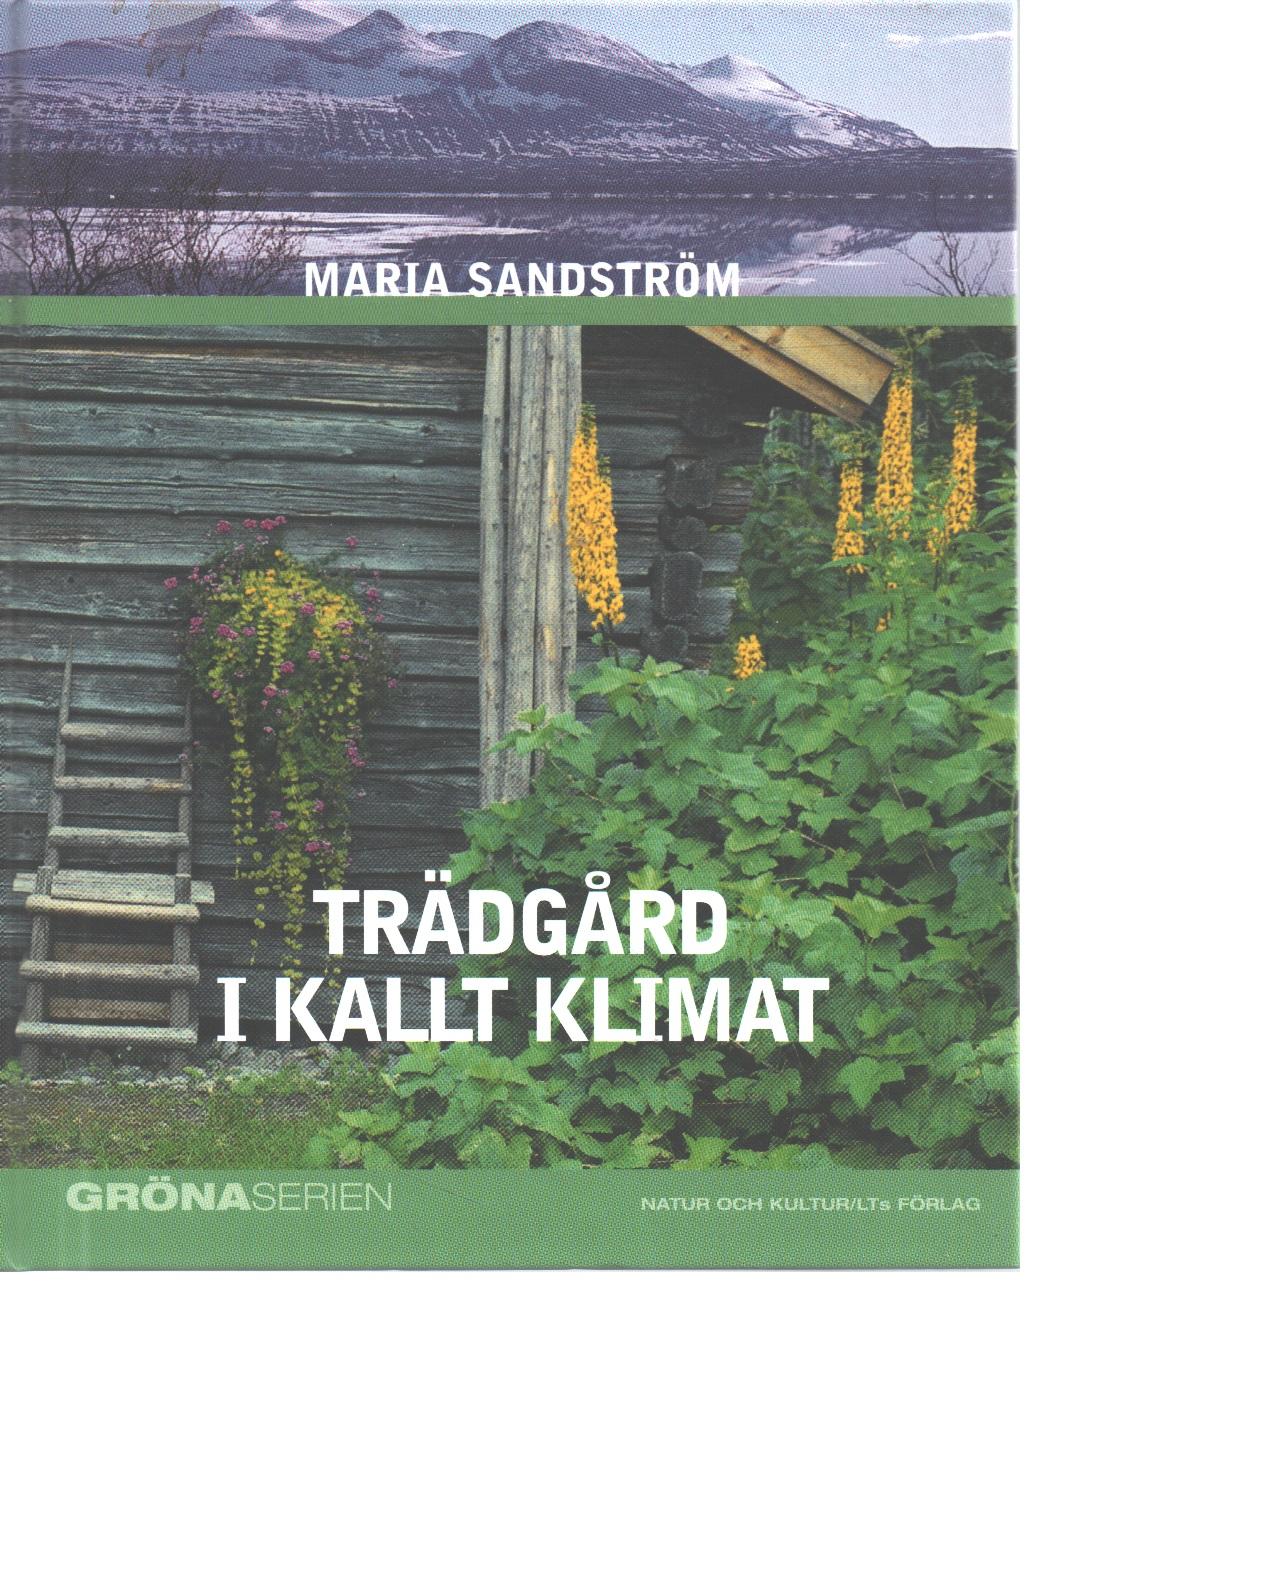 Trädgård i kallt klimat - Sandström, Maria